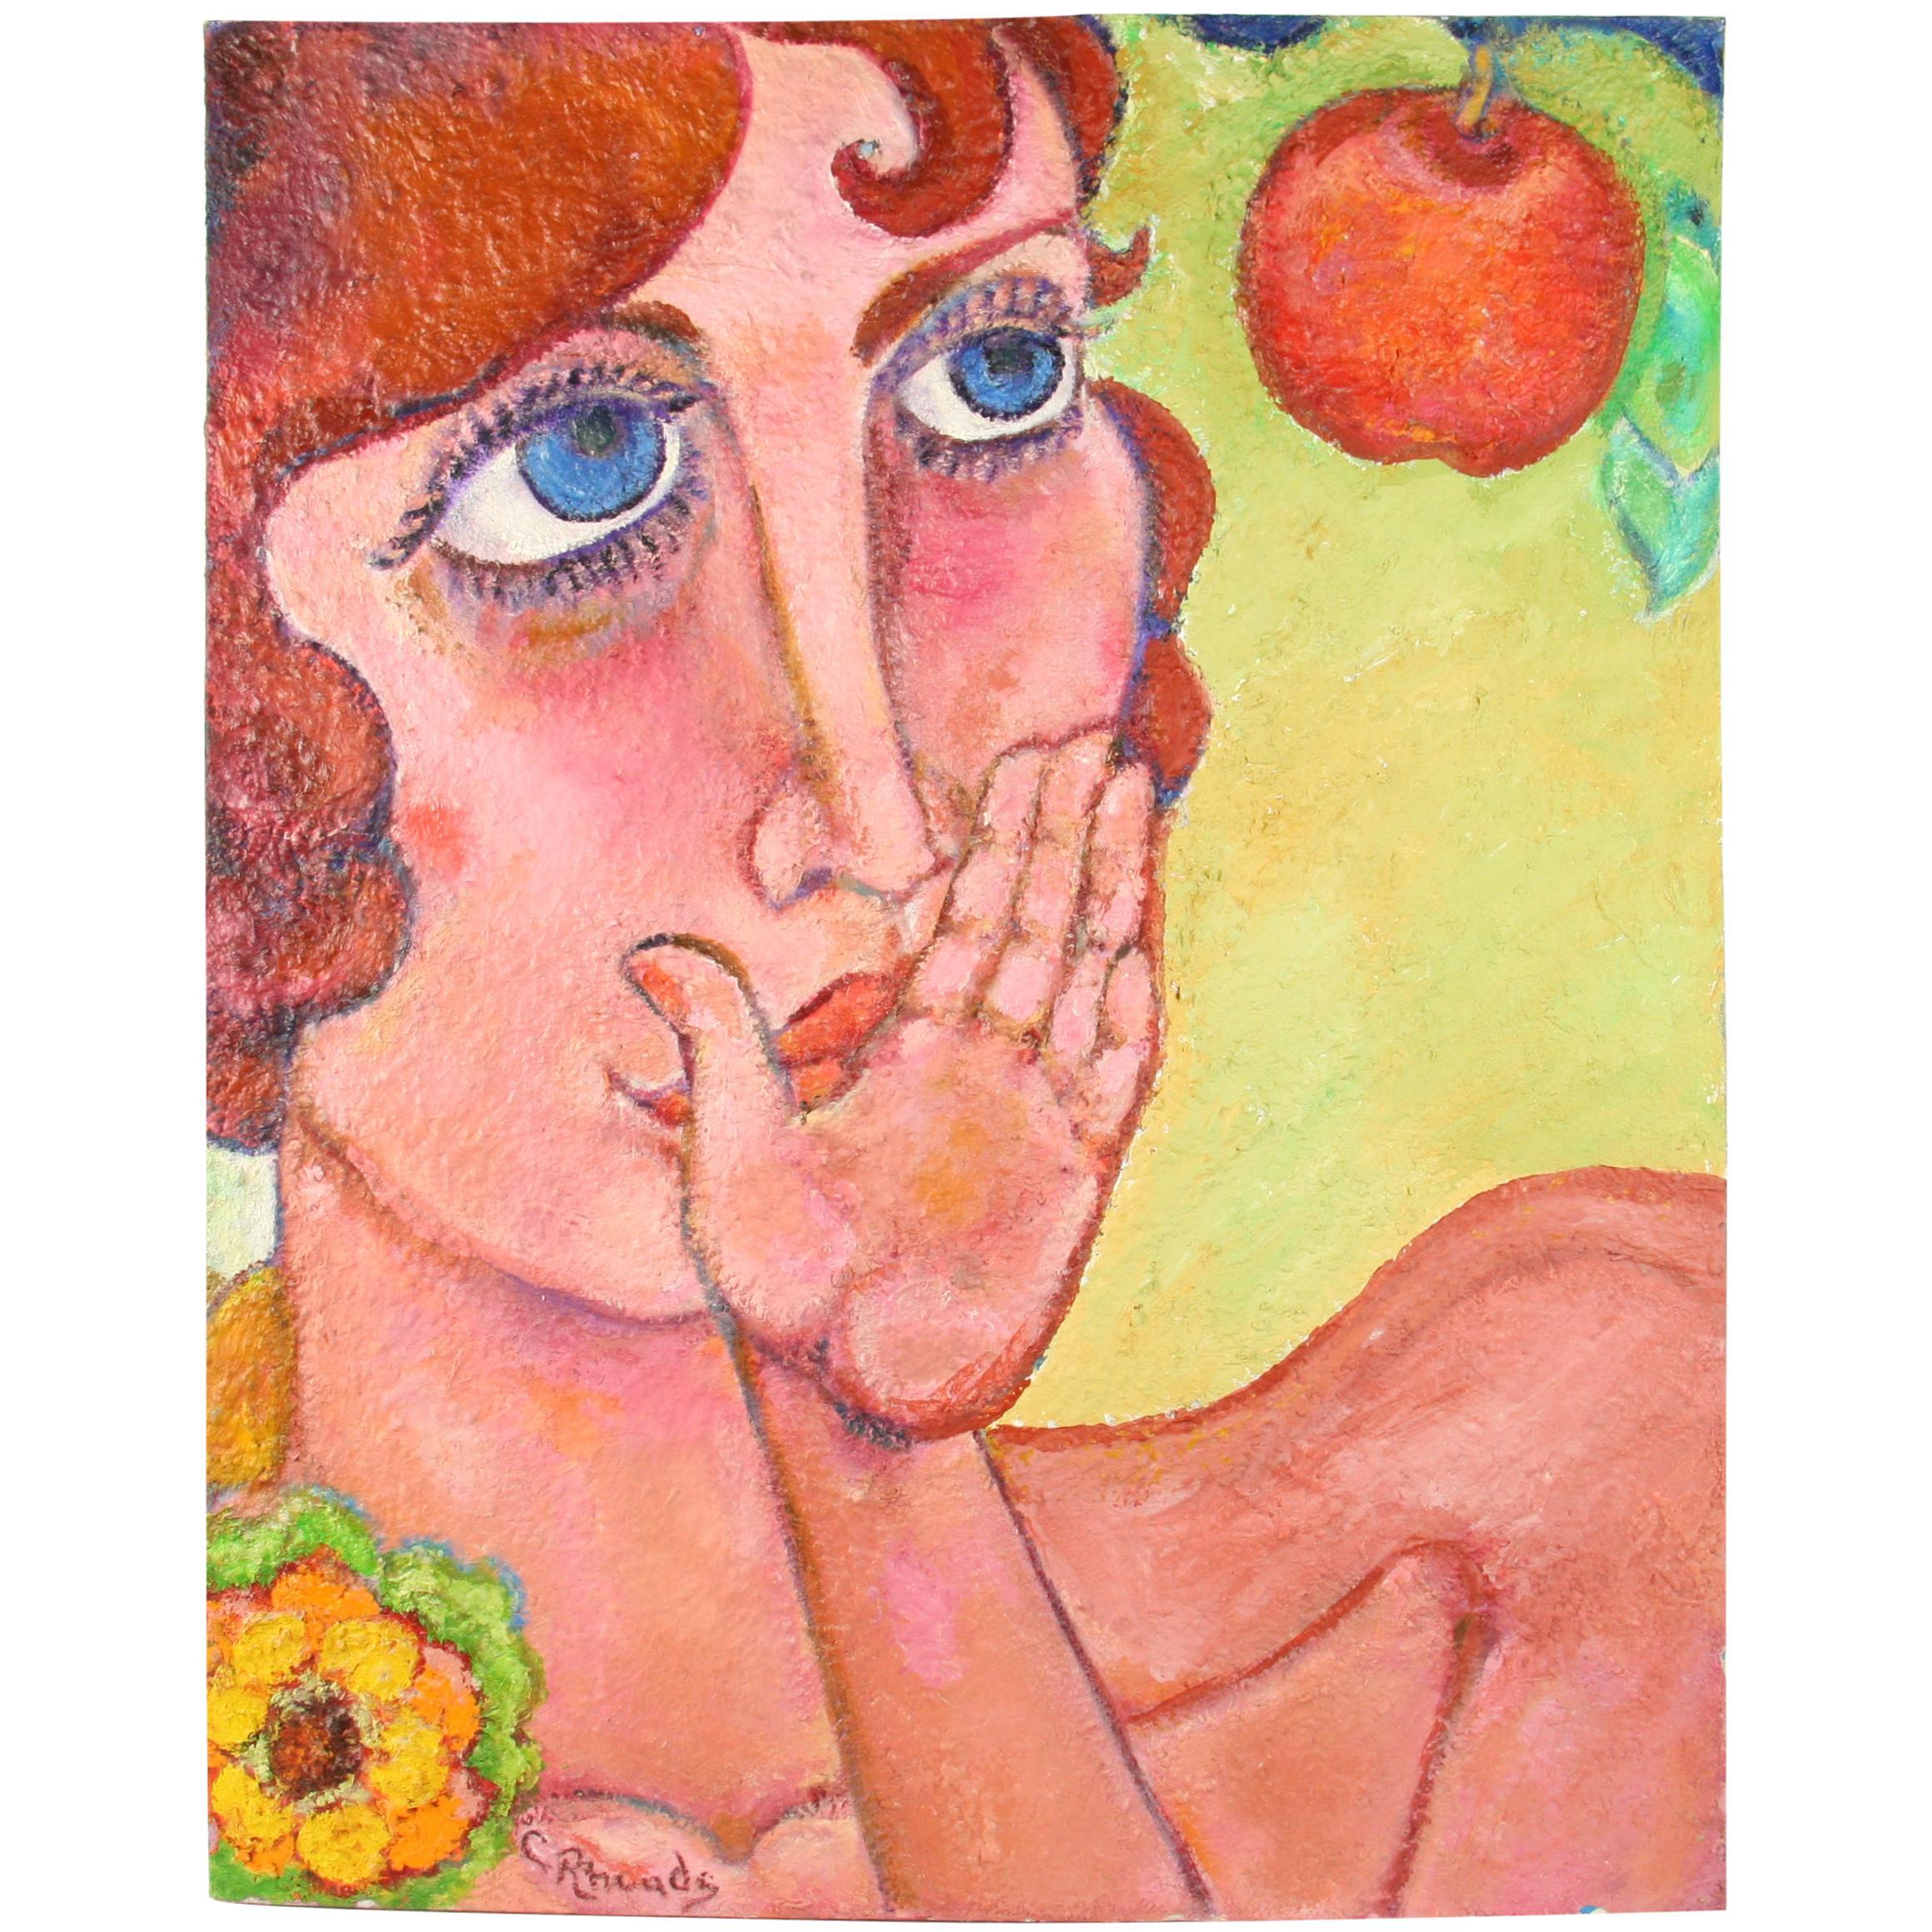 Eva Pop Art Female Painting